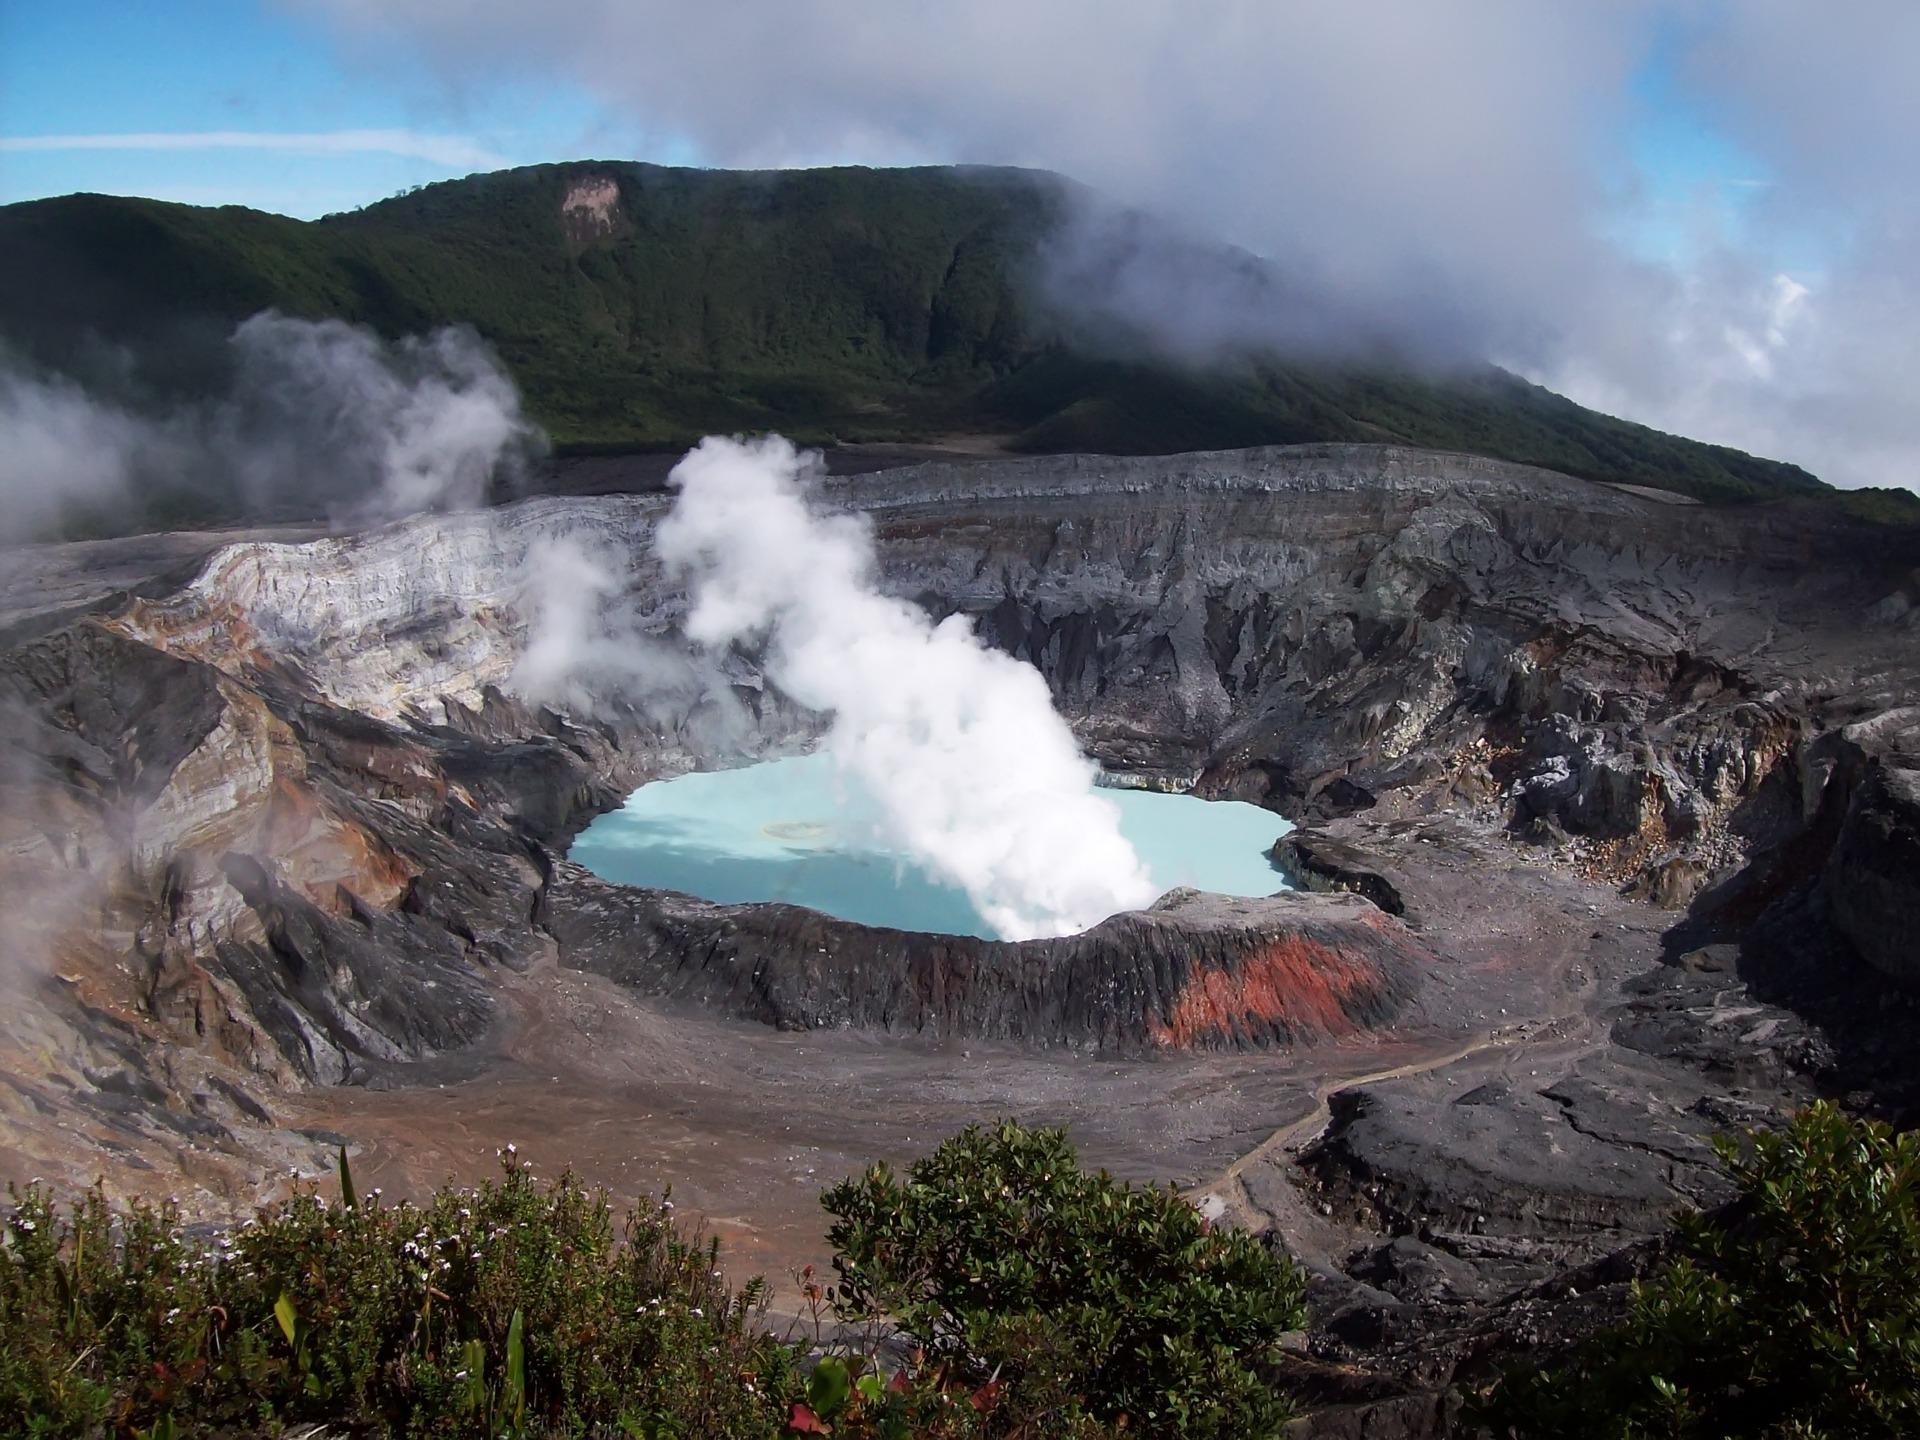 Resultado de imagen para volcán poás